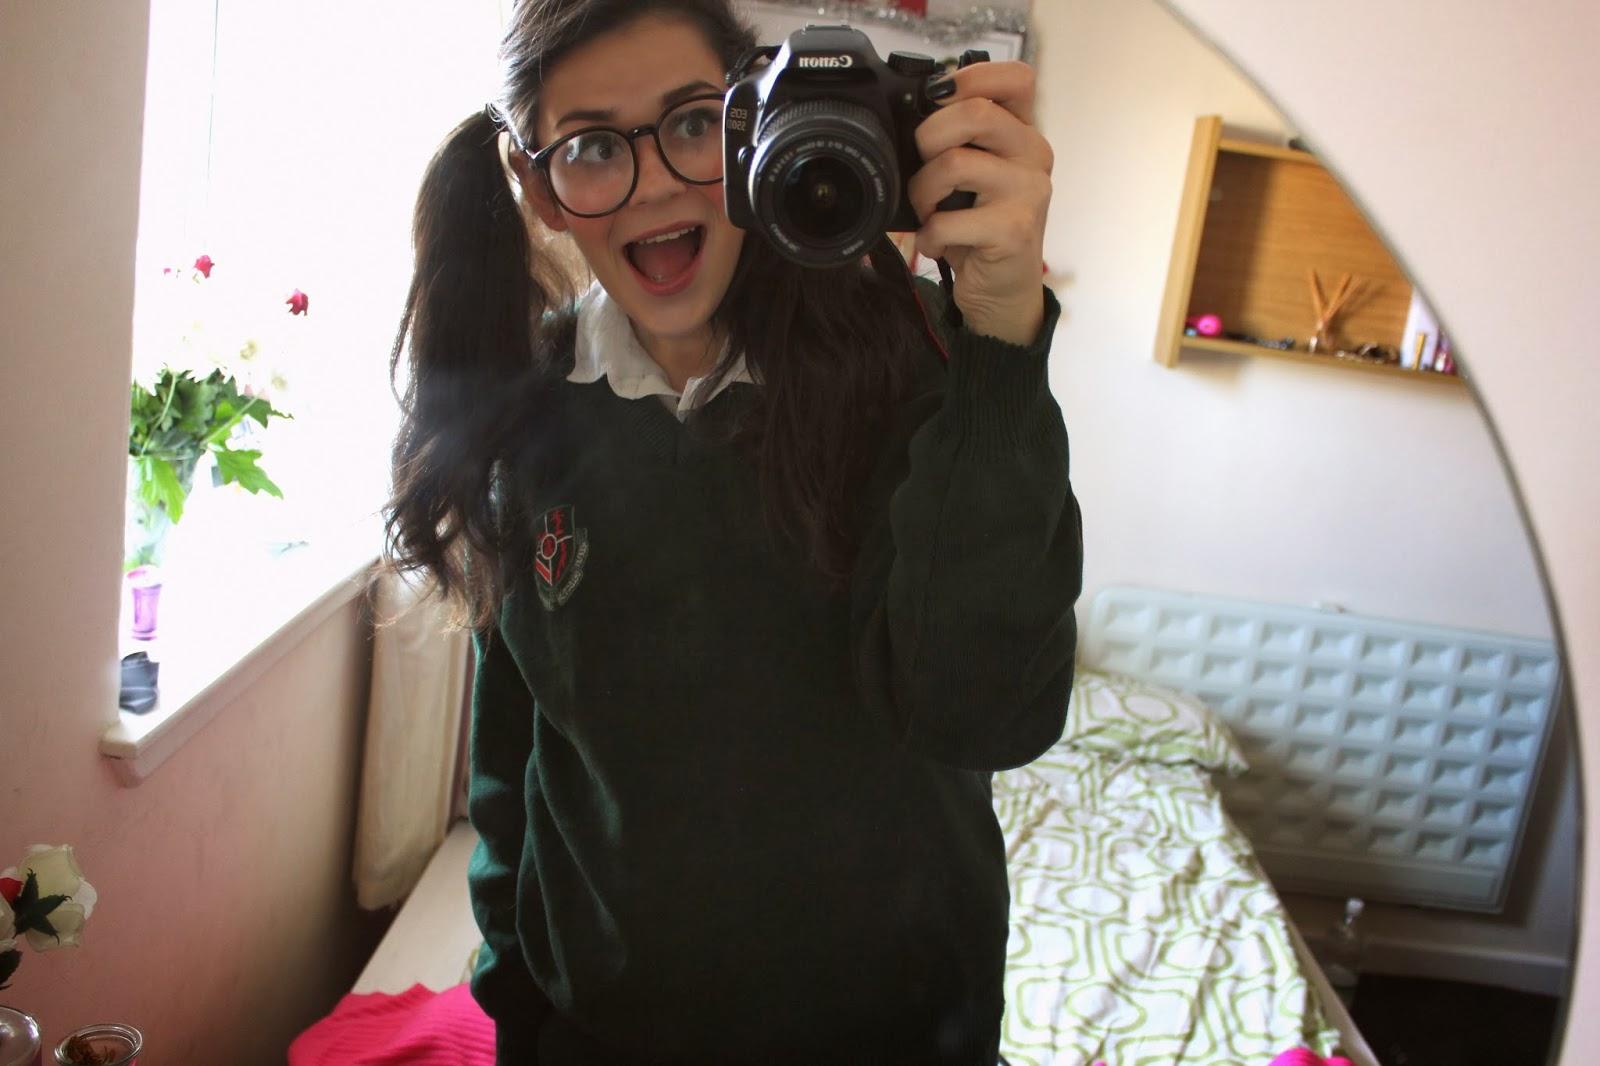 Geek, or rather a school girl